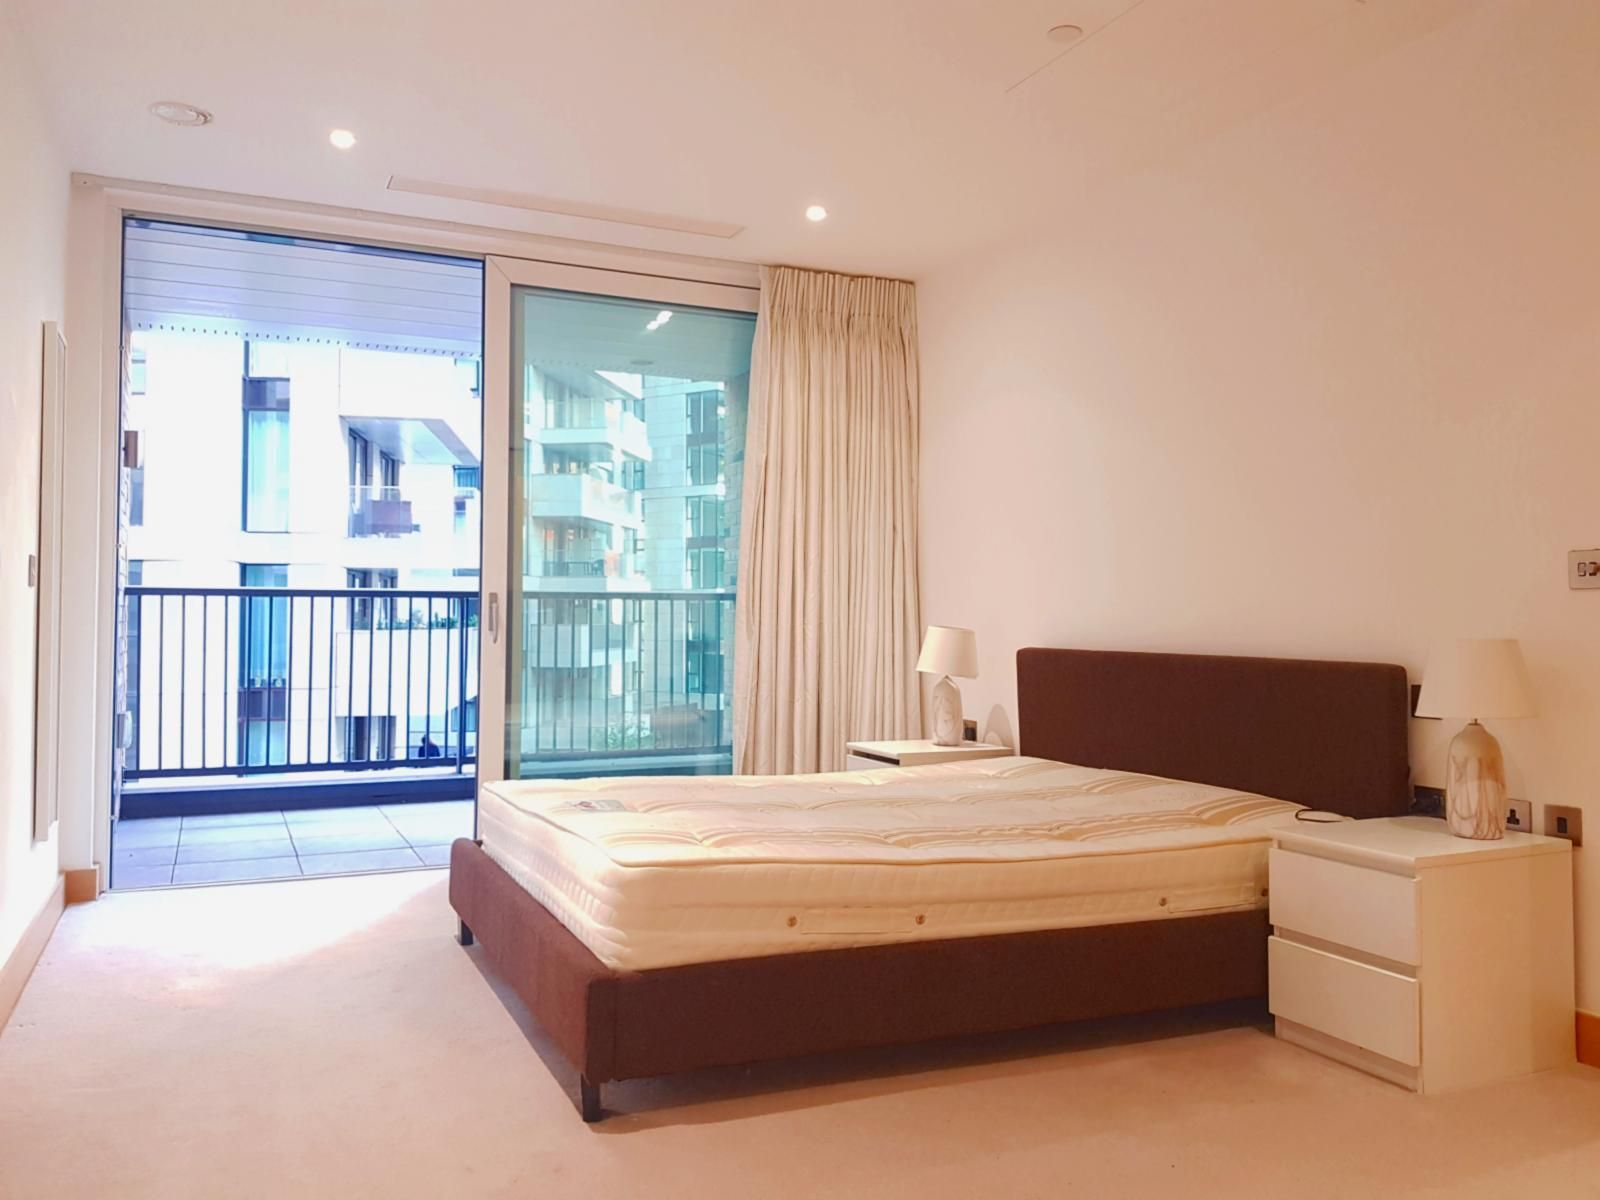 Property photo 1 of 7. 2 Bed 2 Bath Flat, Paddington Exchange, Paddington, W2